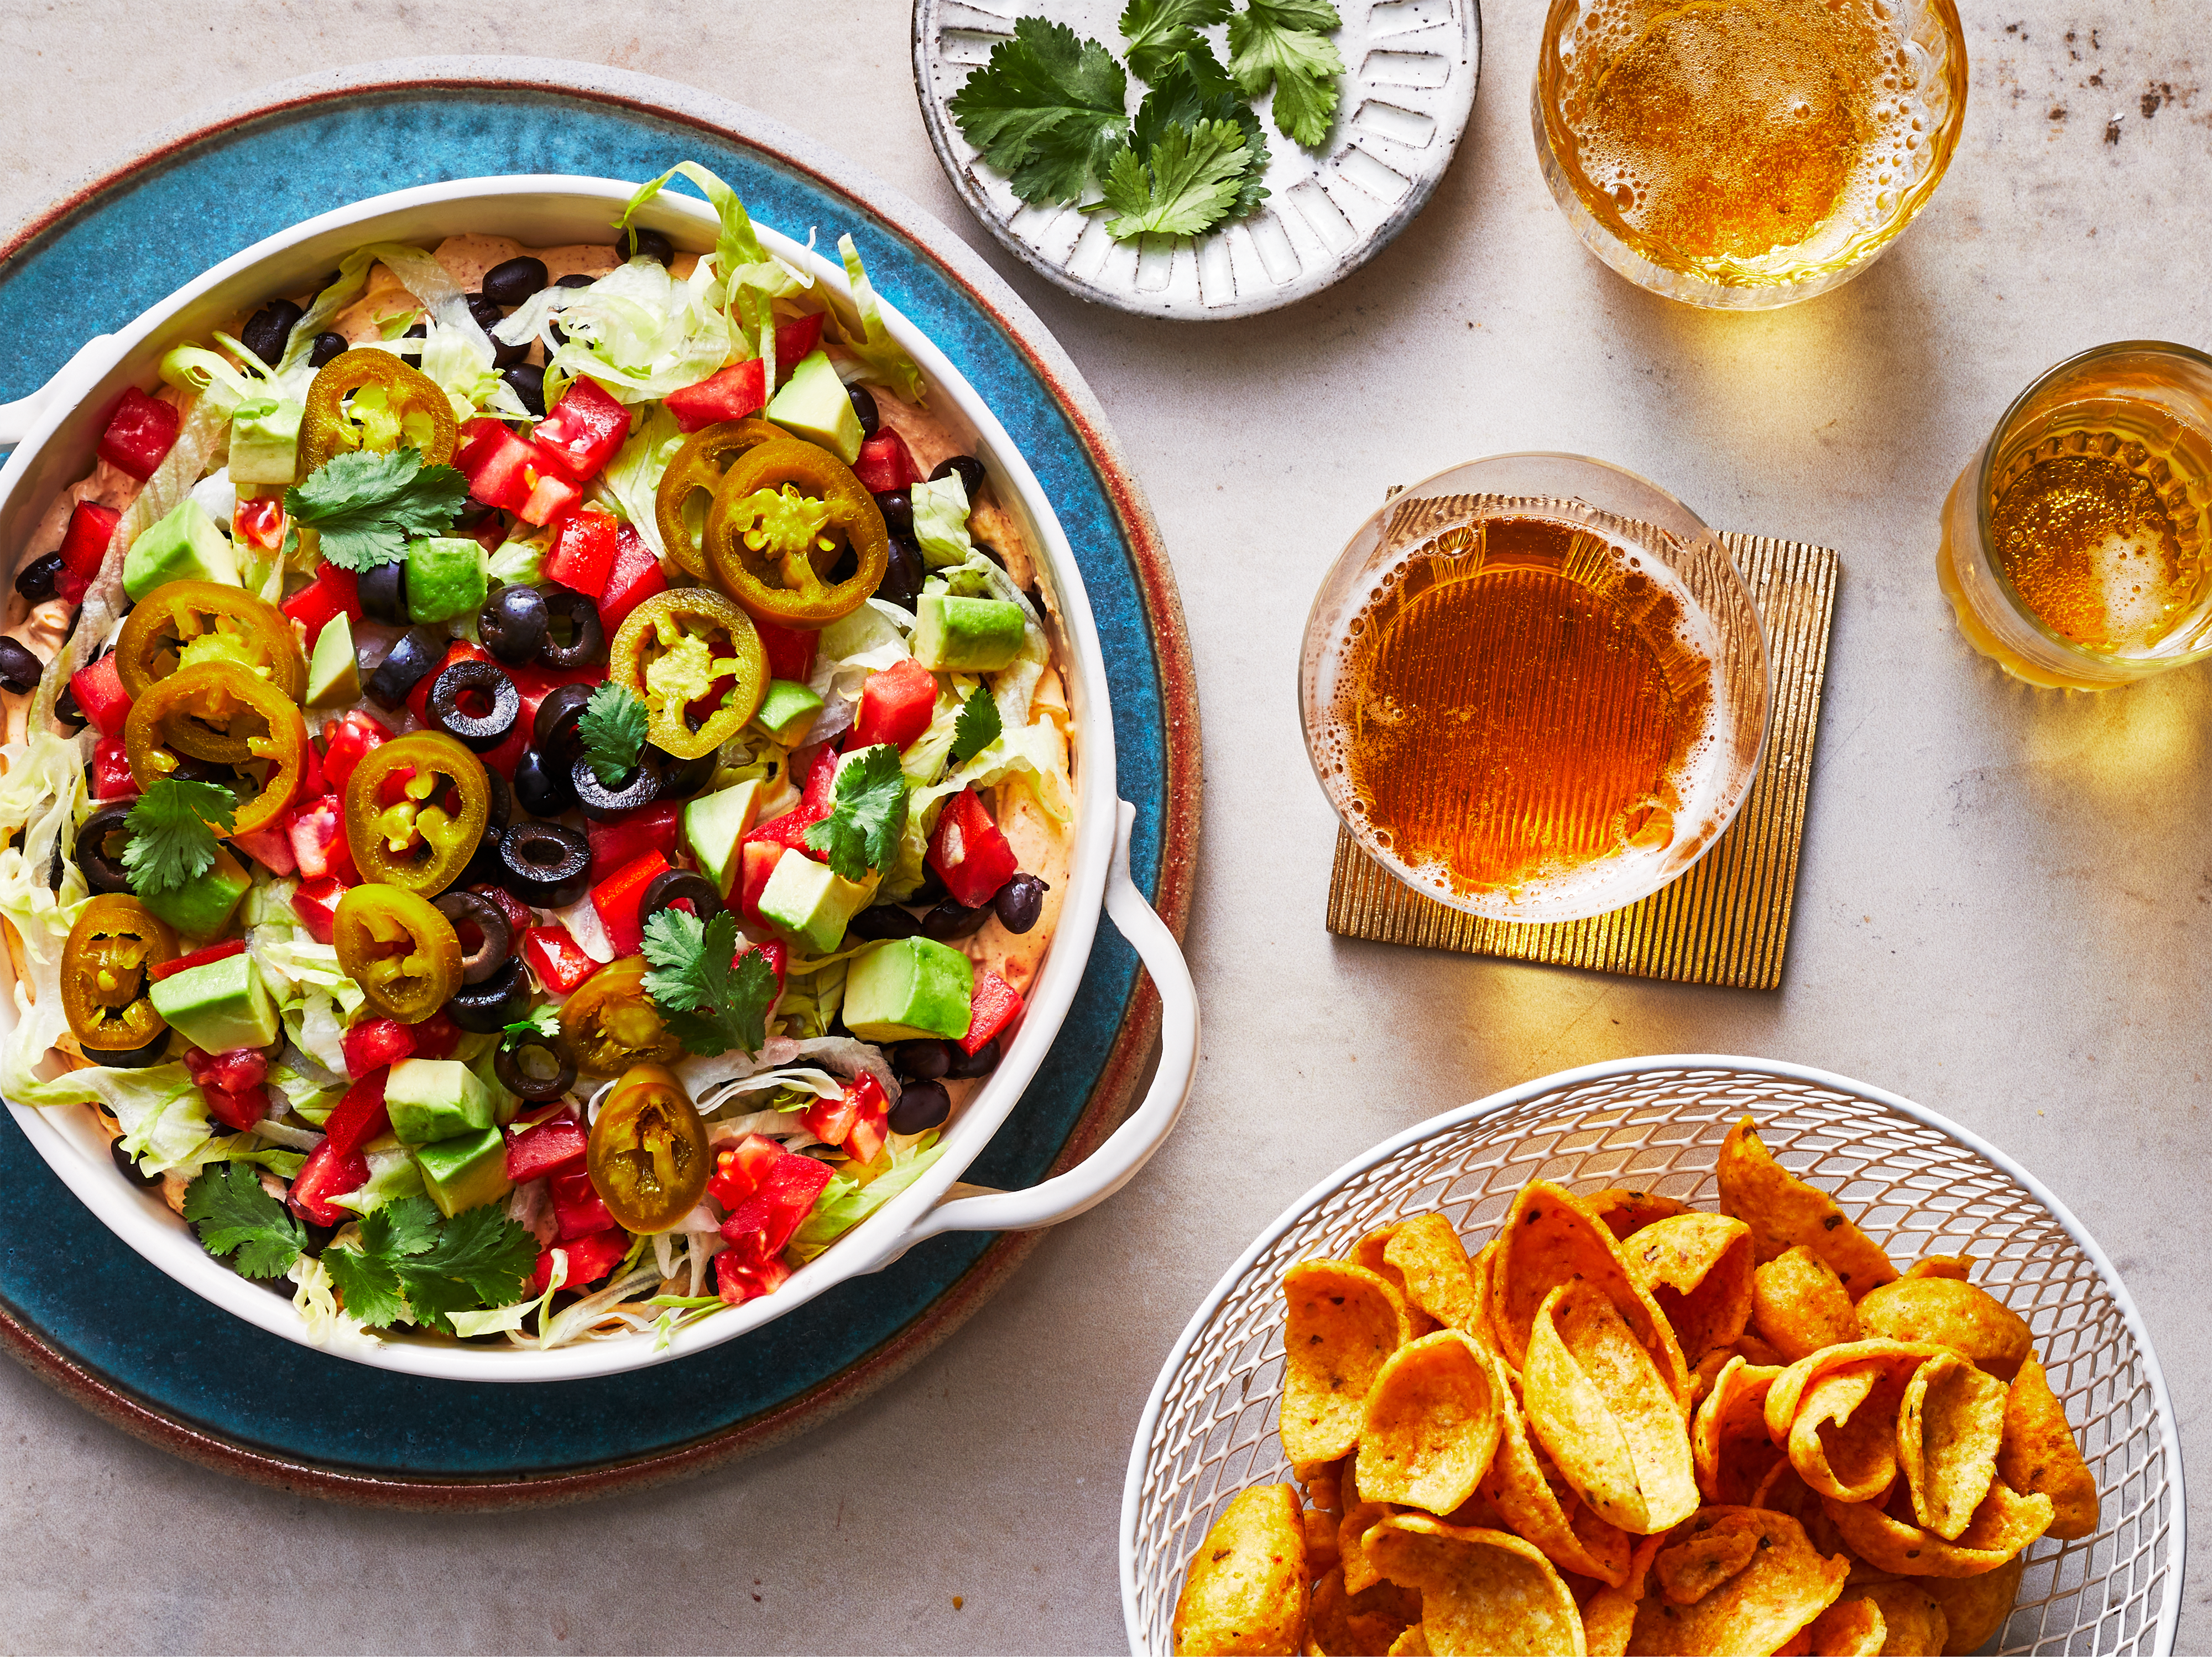 mr - Taco Dip Image